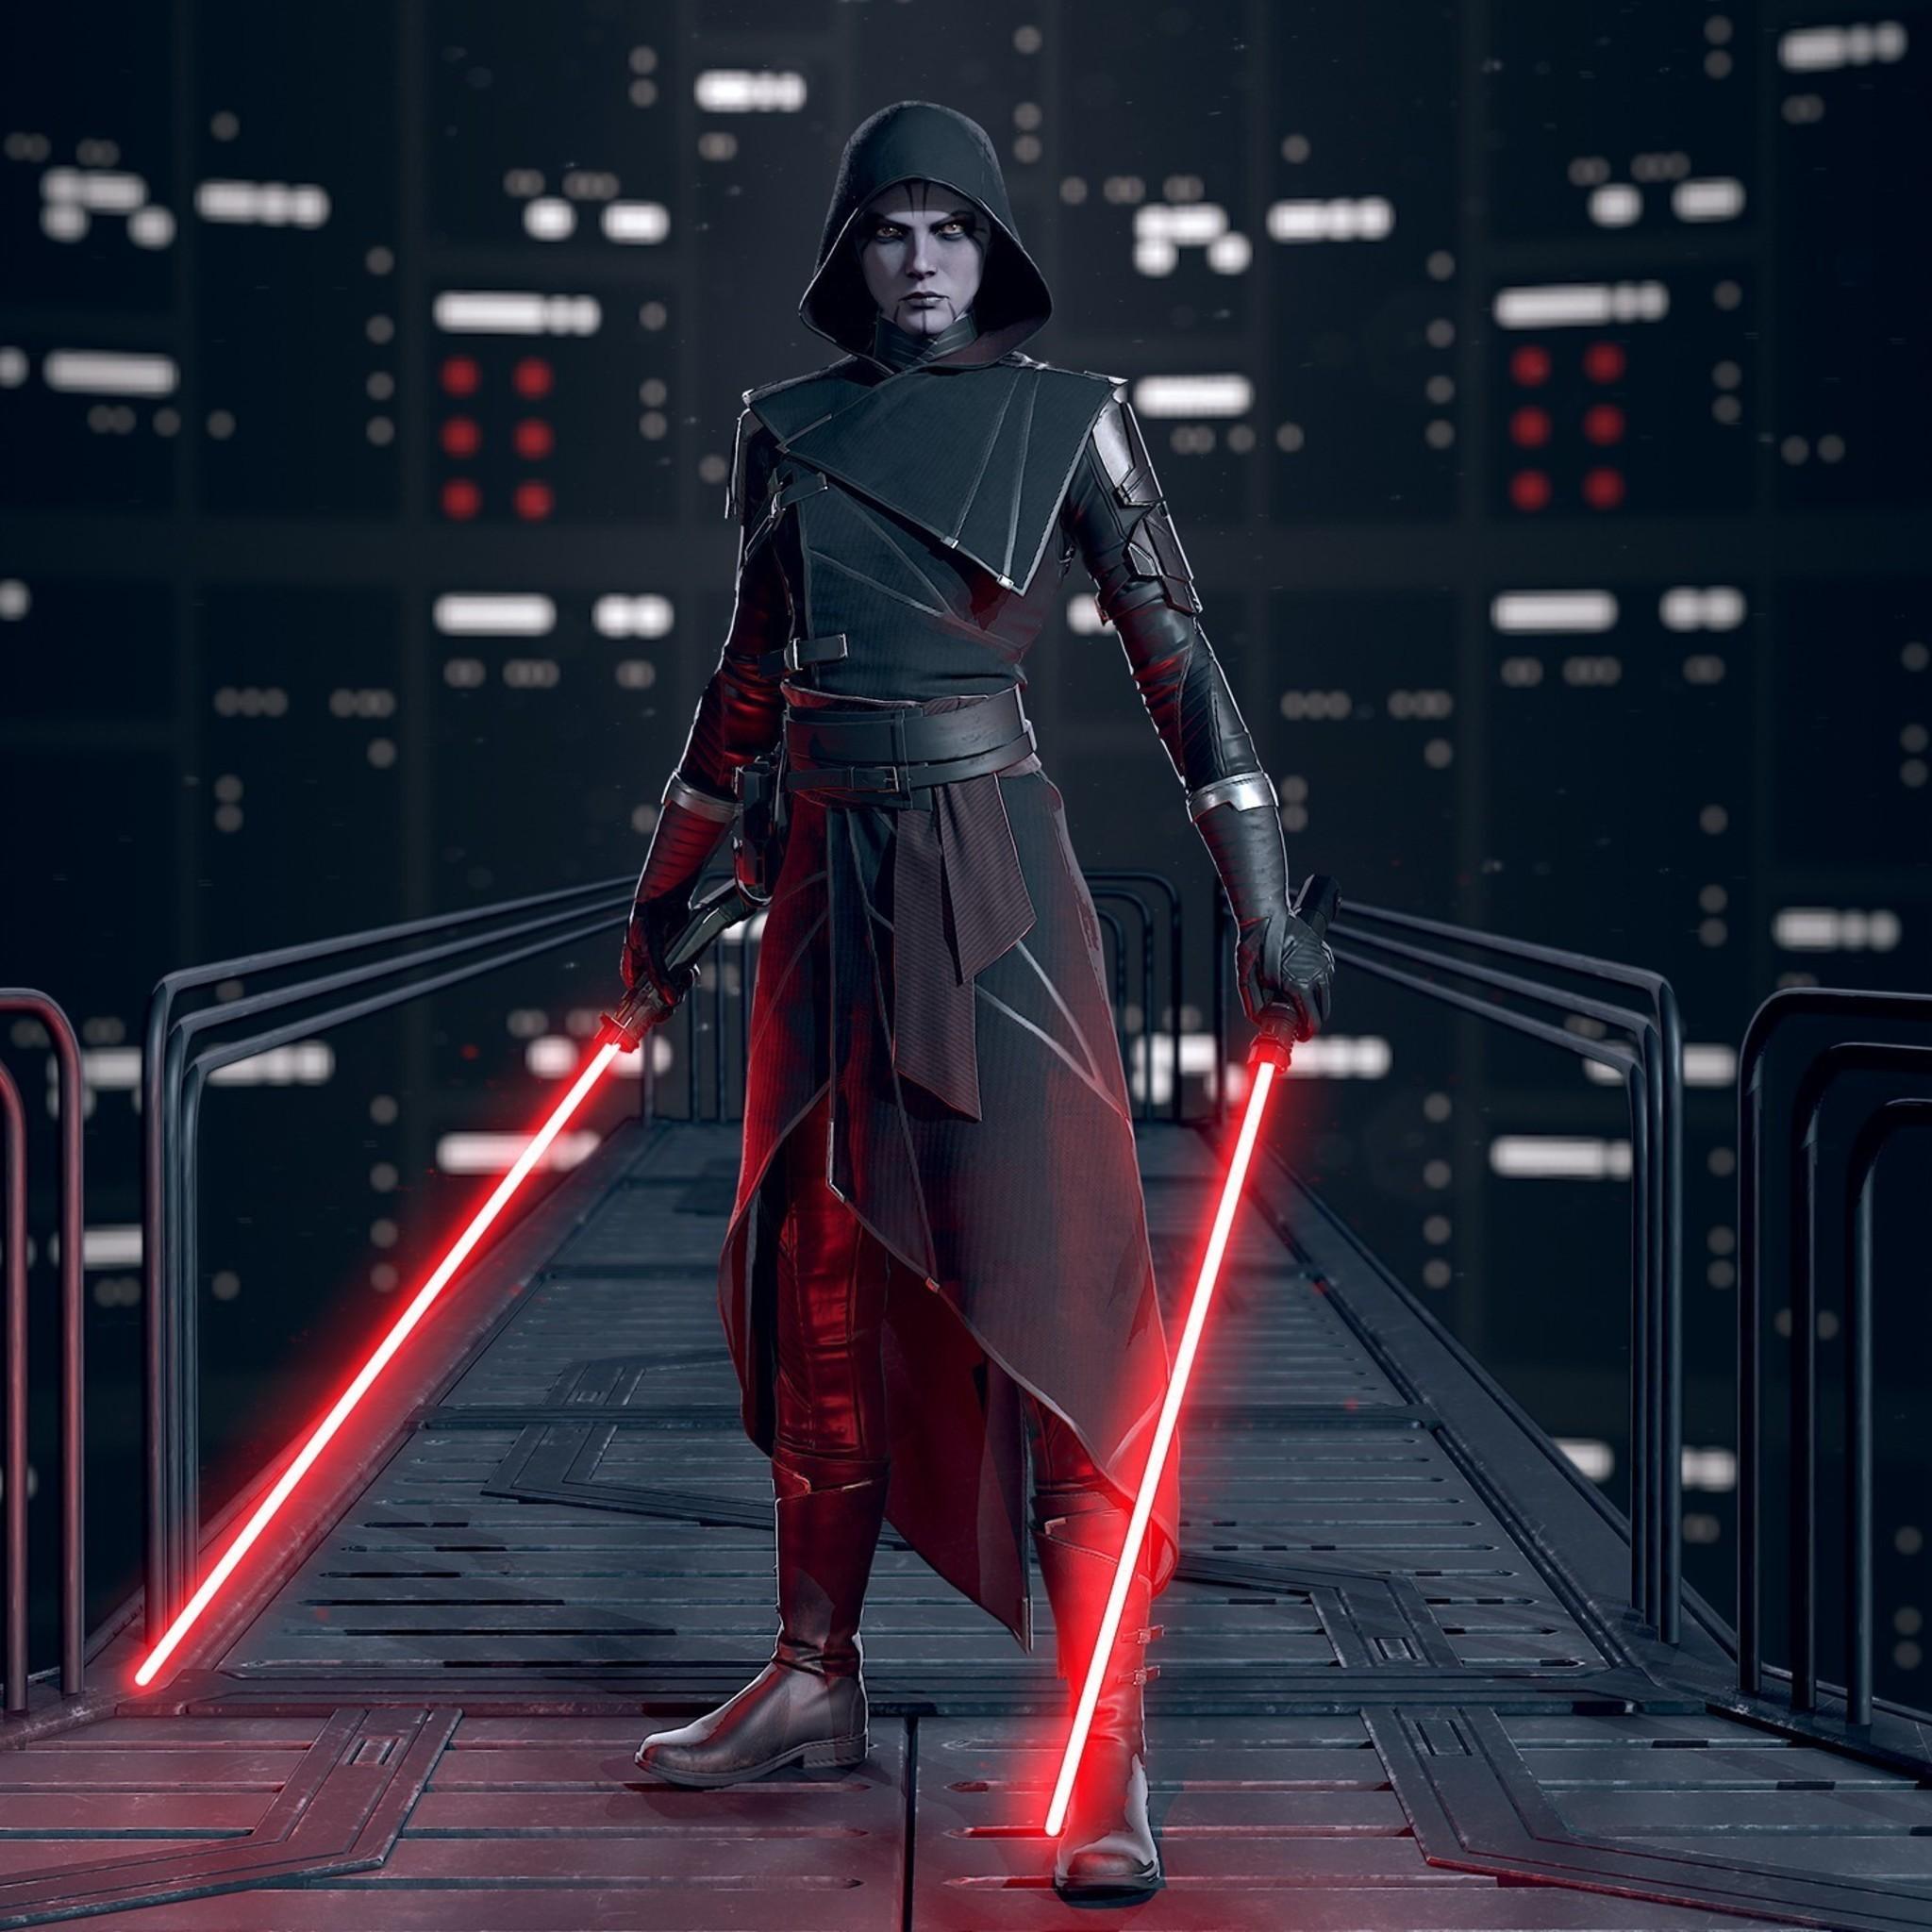 star-wars-lightsaber-art.jpg